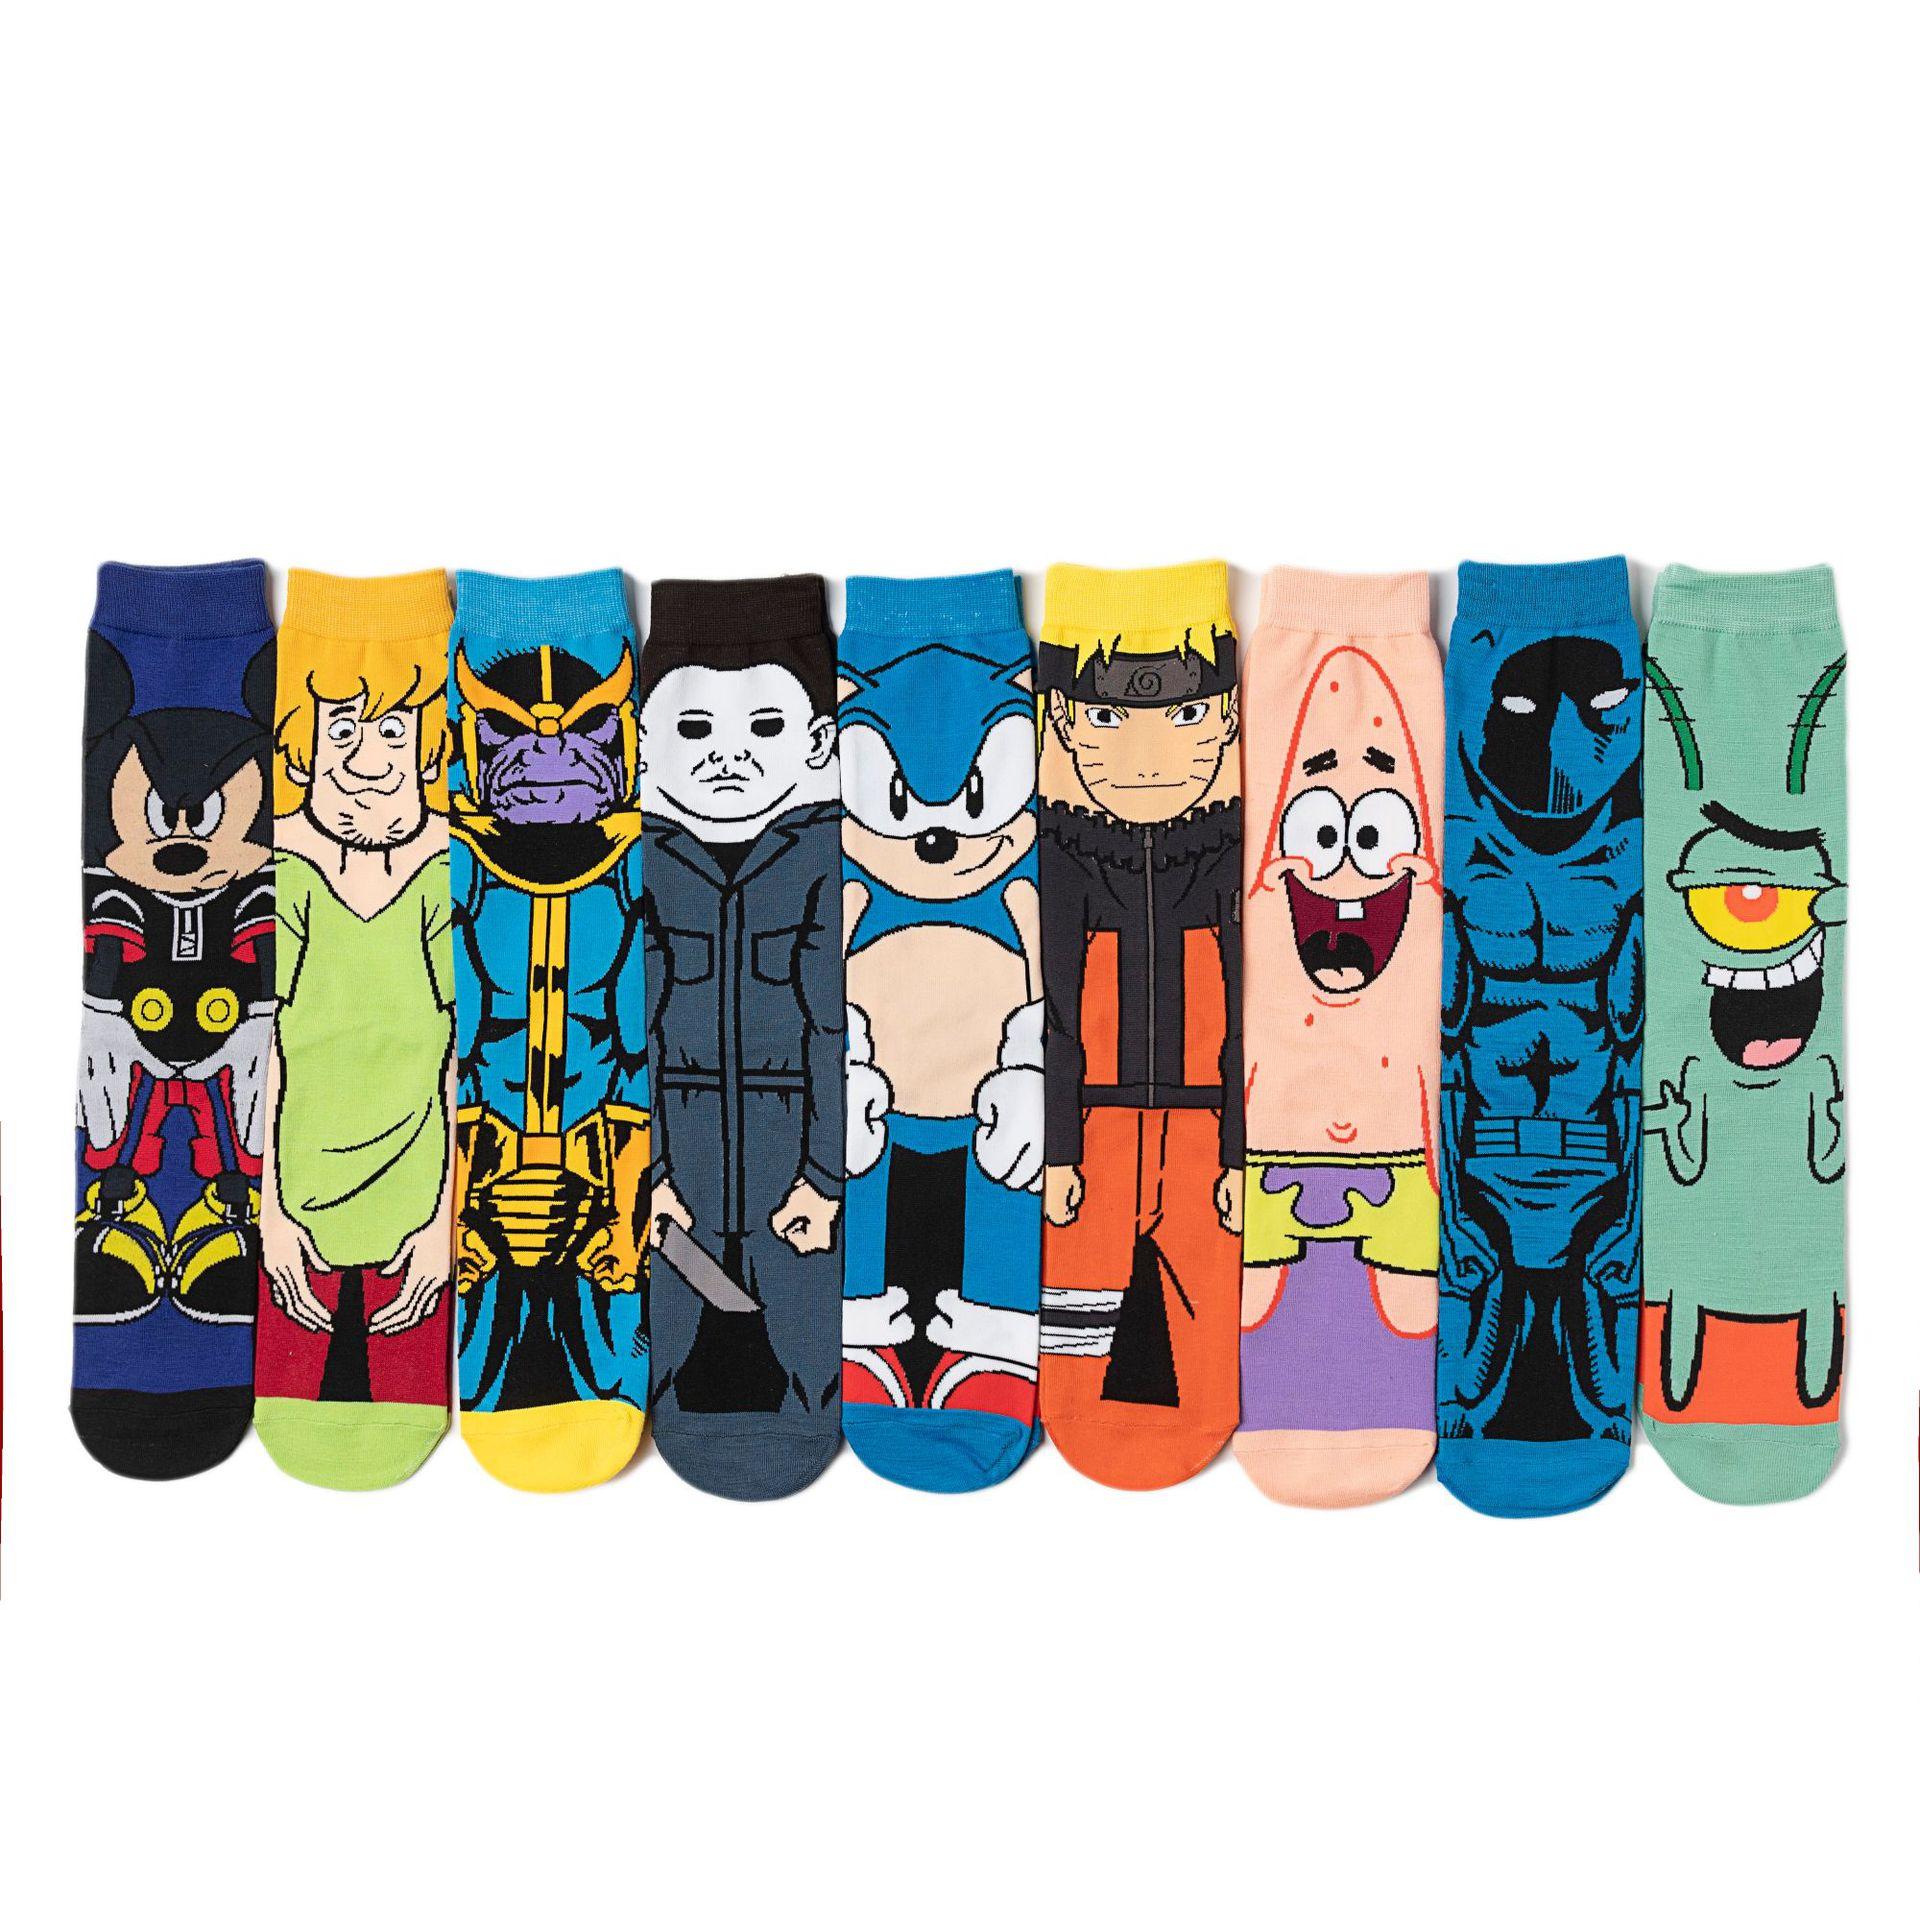 Men Brand Cartoon Character Cotton Socks Harajuku Female Cute Unisex Skatebord Socks Hipster Fashion Animal Print Long Socks